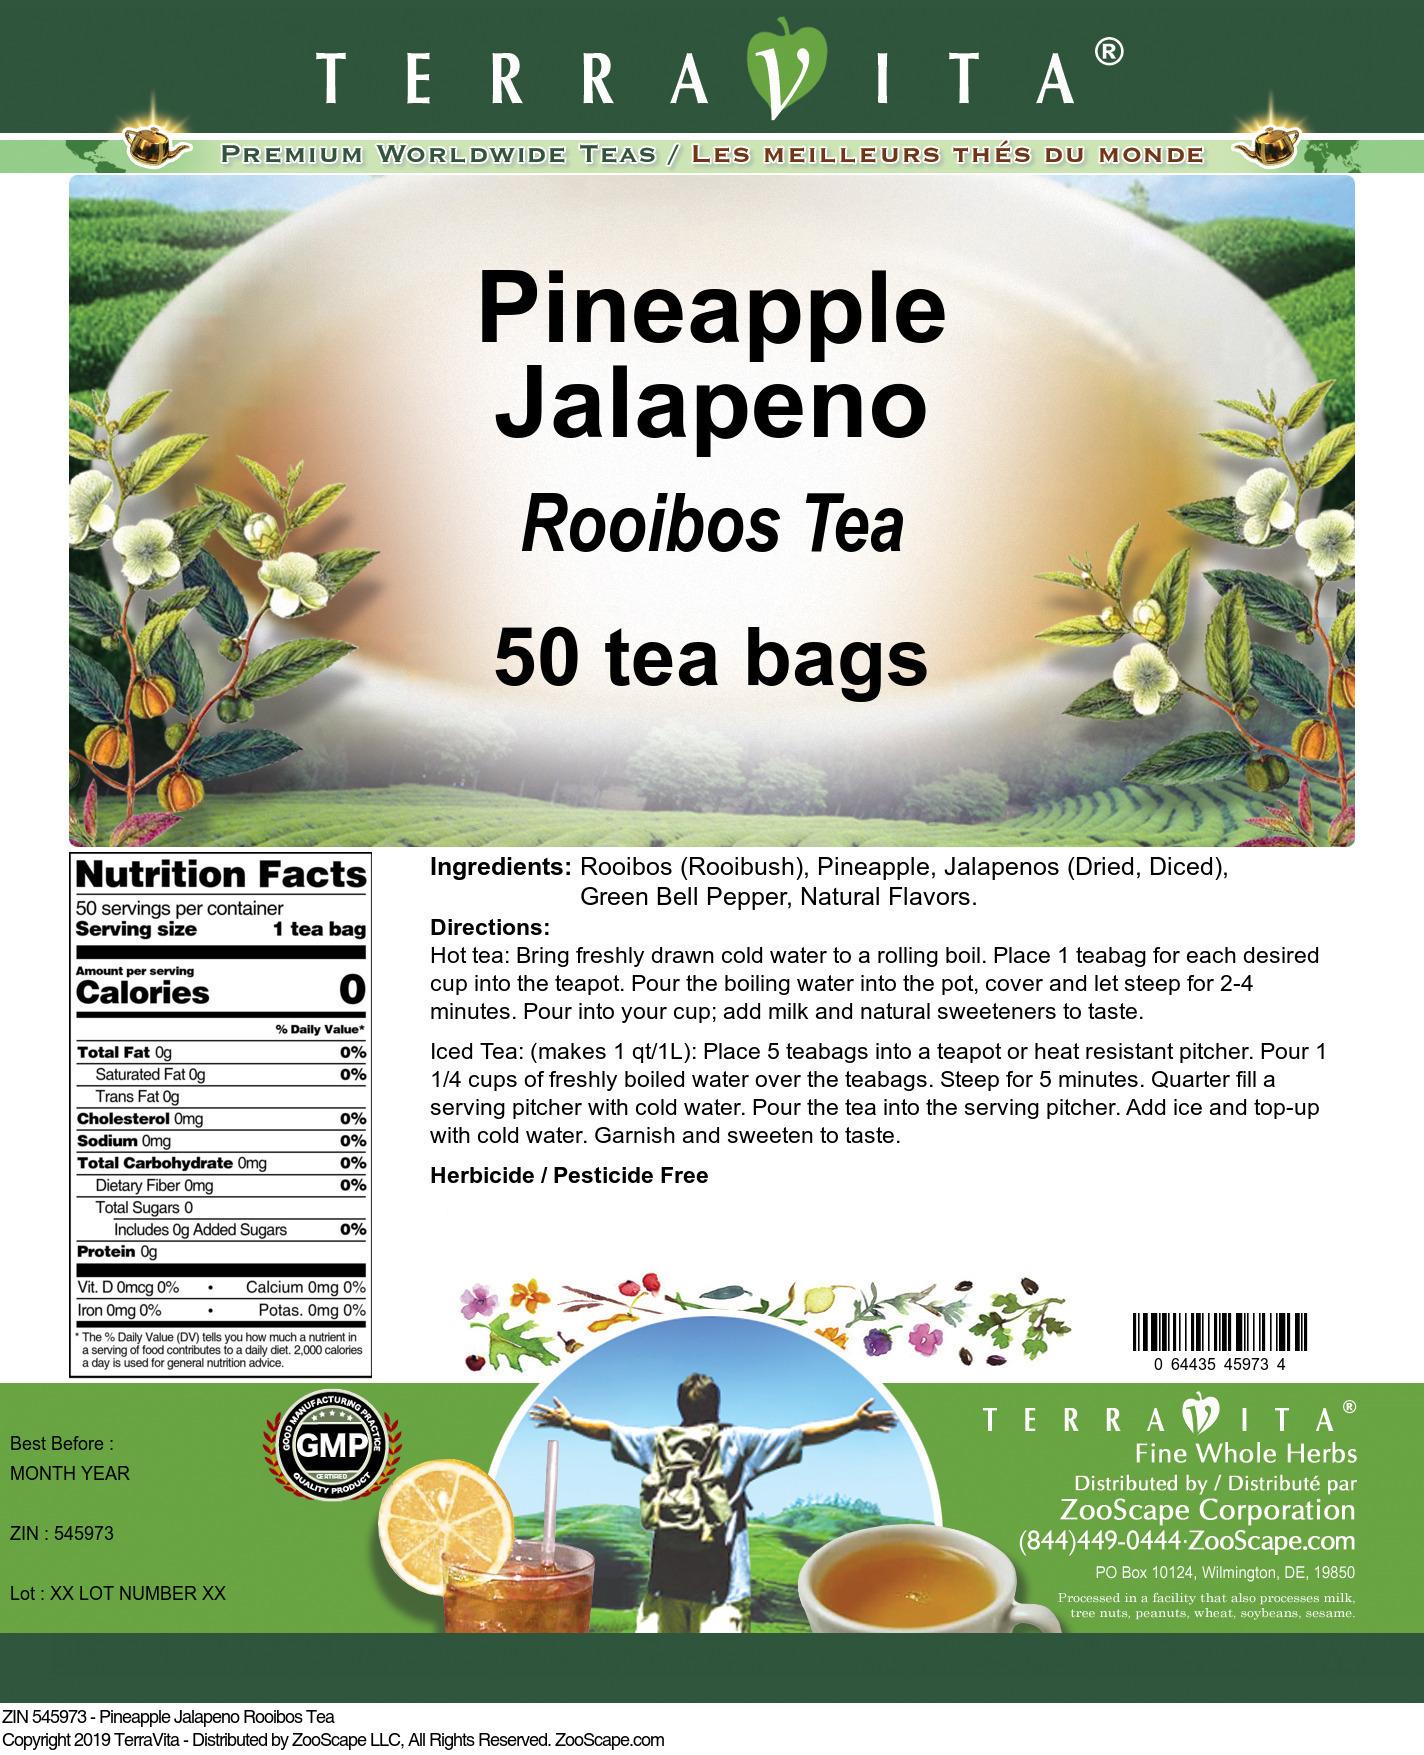 Pineapple Jalapeno Rooibos Tea